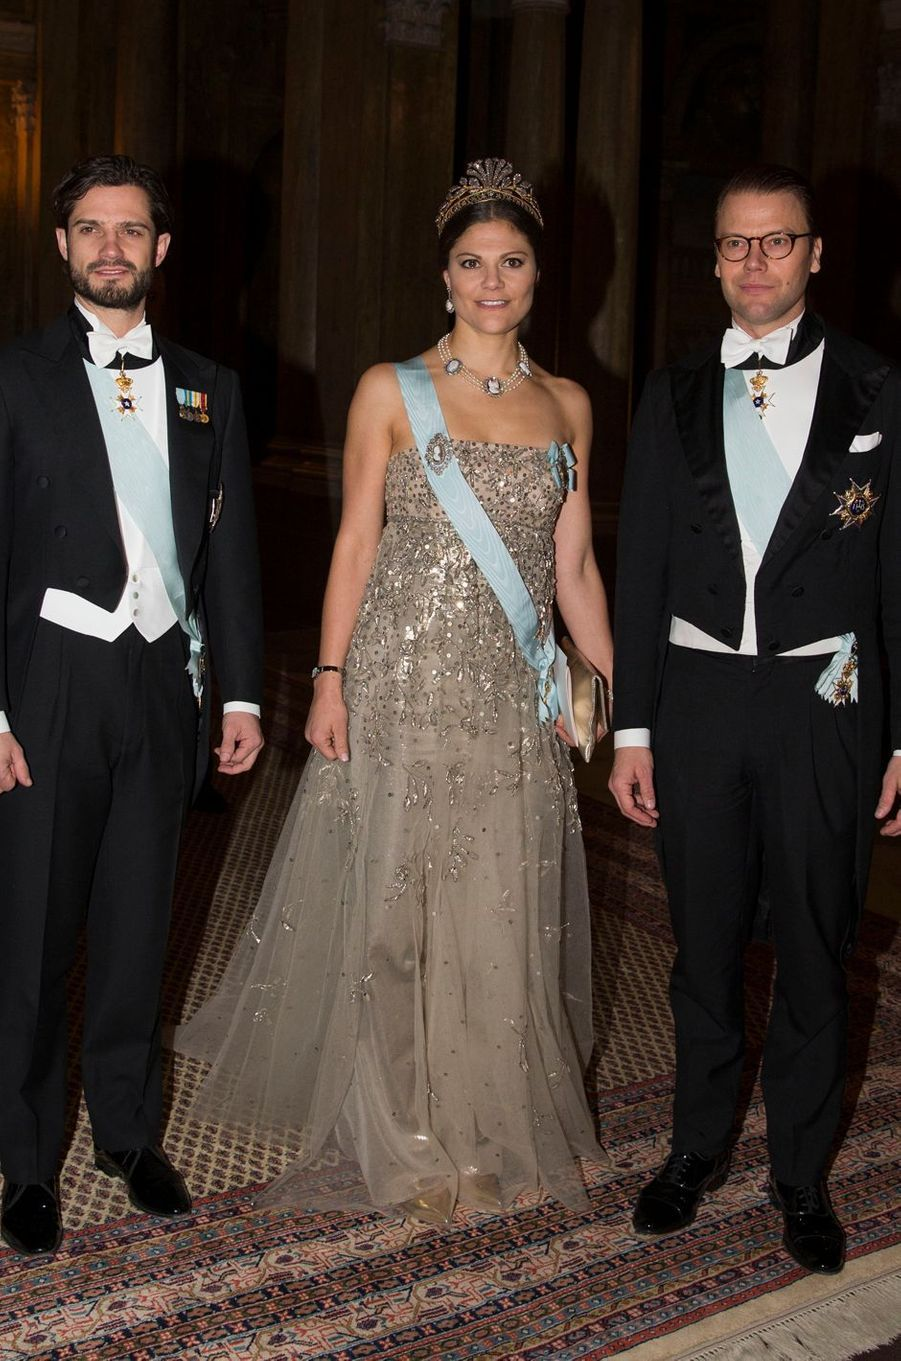 La princesse Victoria de Suède dans une robe Fadi el Khoury, le 10 décembre 2013